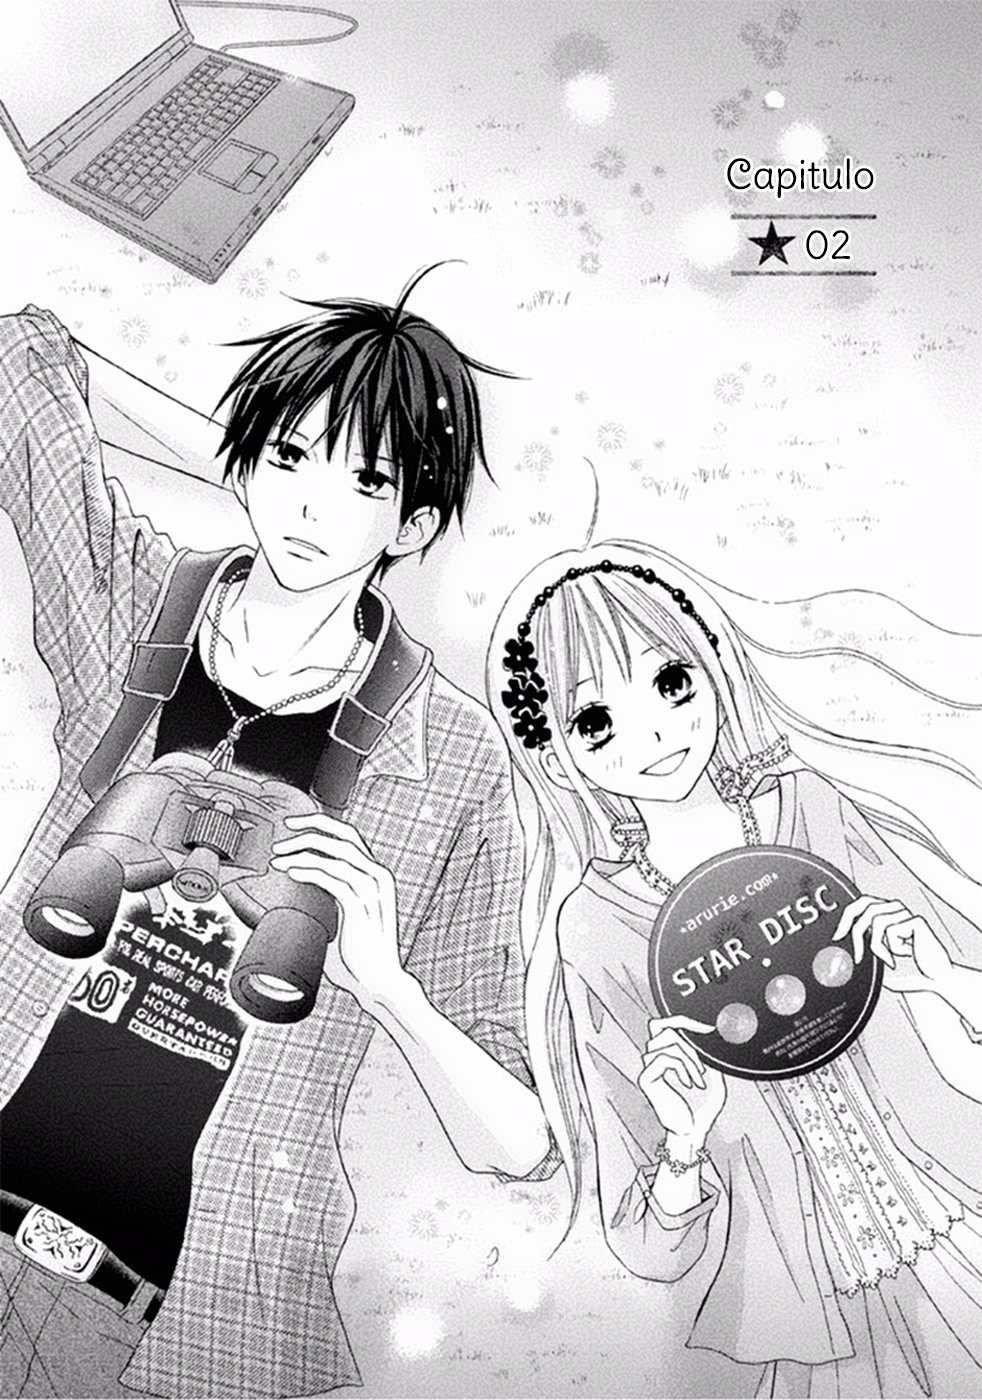 Hit or Miss? Version manga - animé - Page 15 6sbqup10